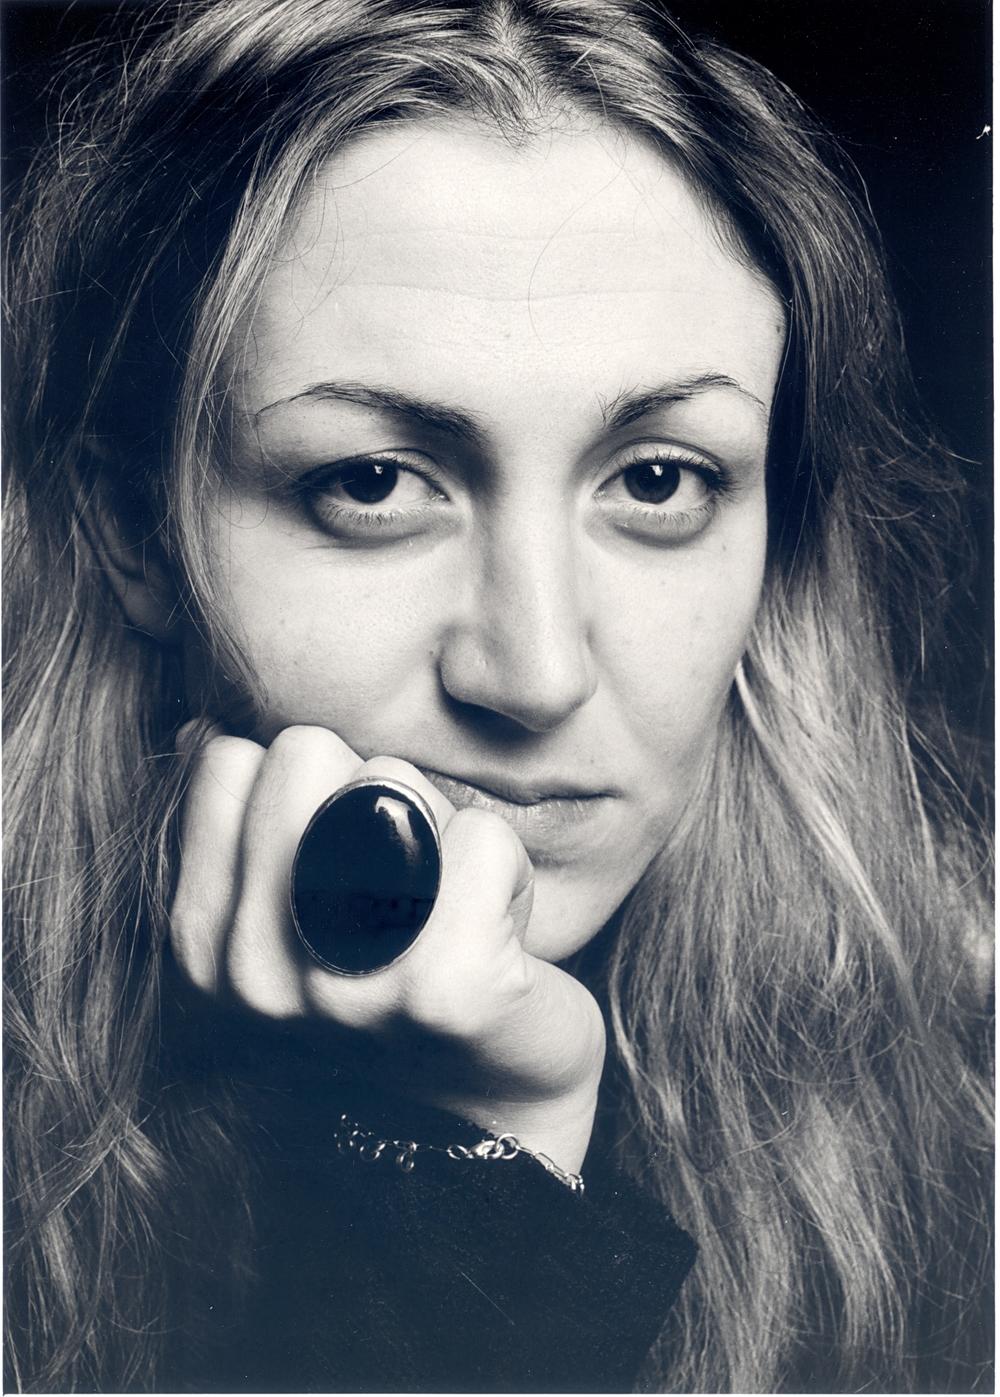 Francesca+Marotta+Portrait.jpg